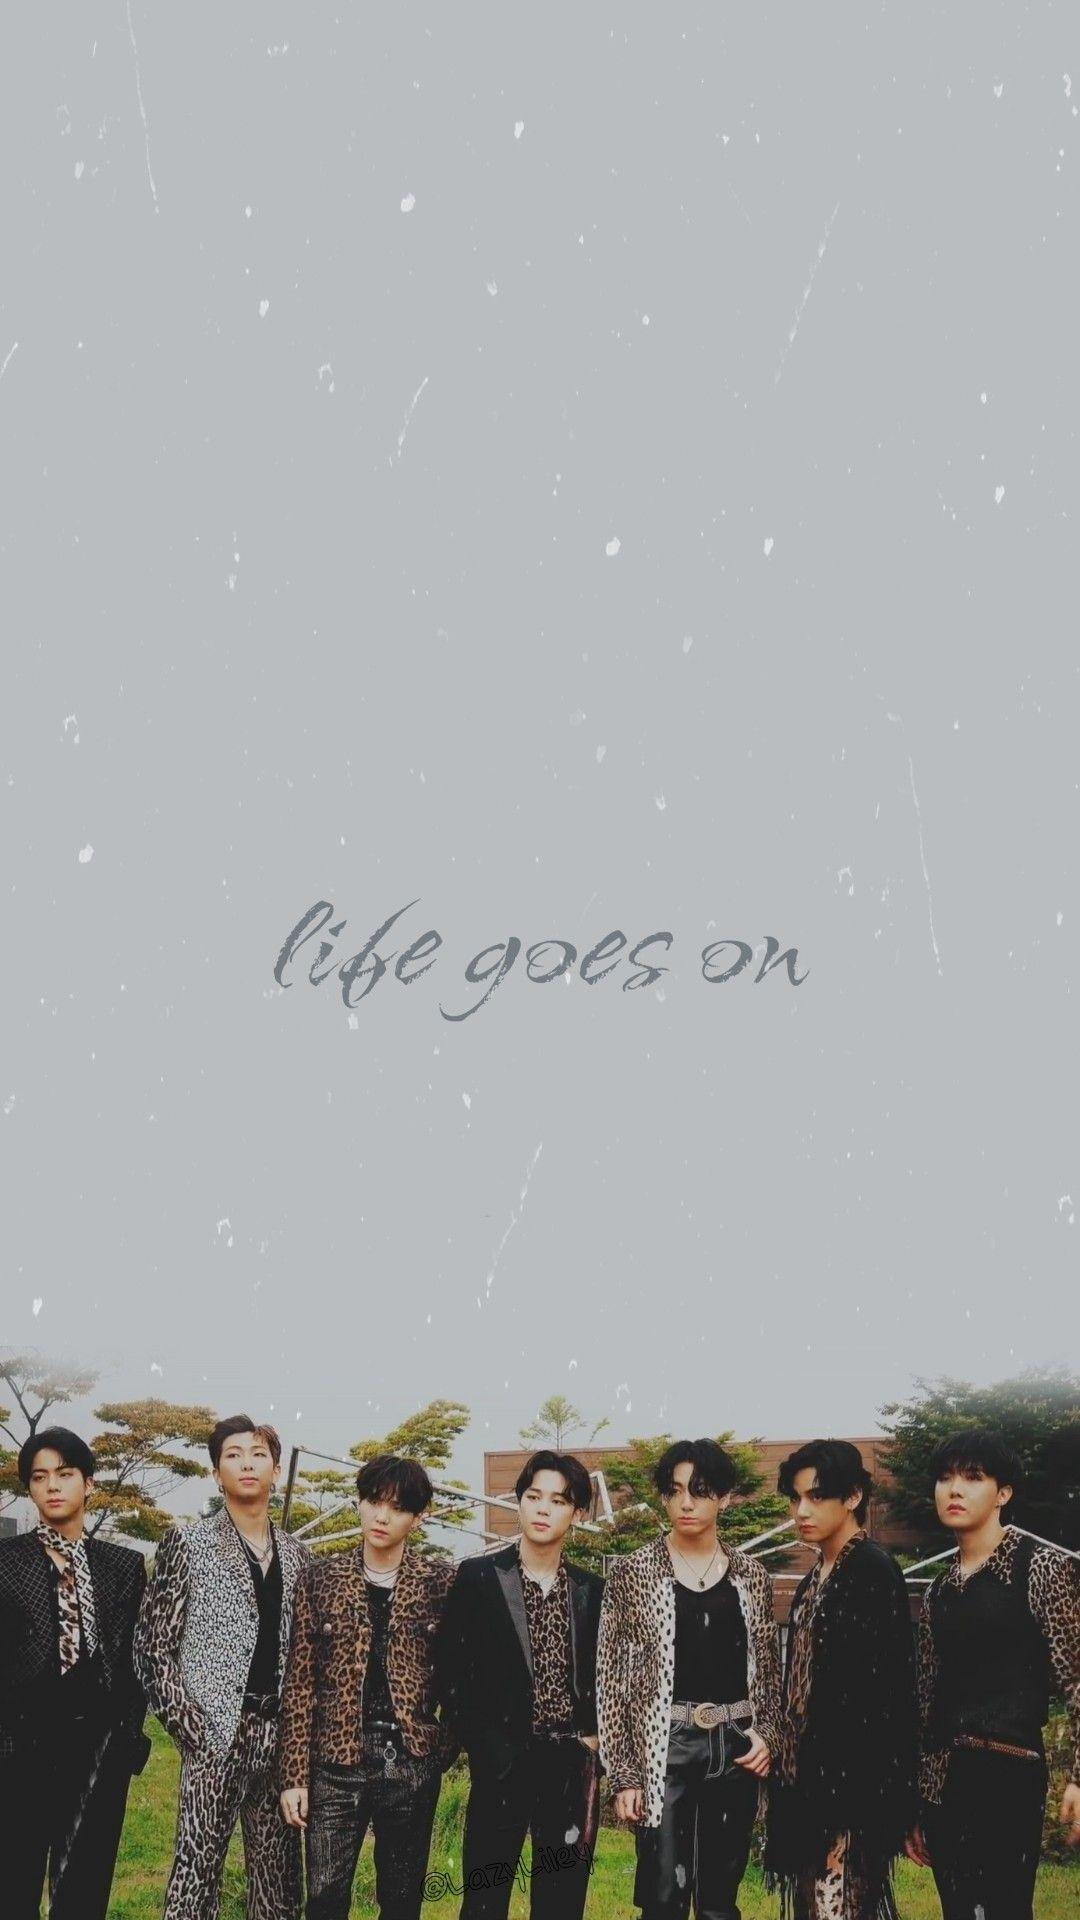 Life Goes On Bts Wallpaper Bts Wallpaper Bts Wallpaper Lyrics Life Goes On Bts wallpaper laptop life goes on